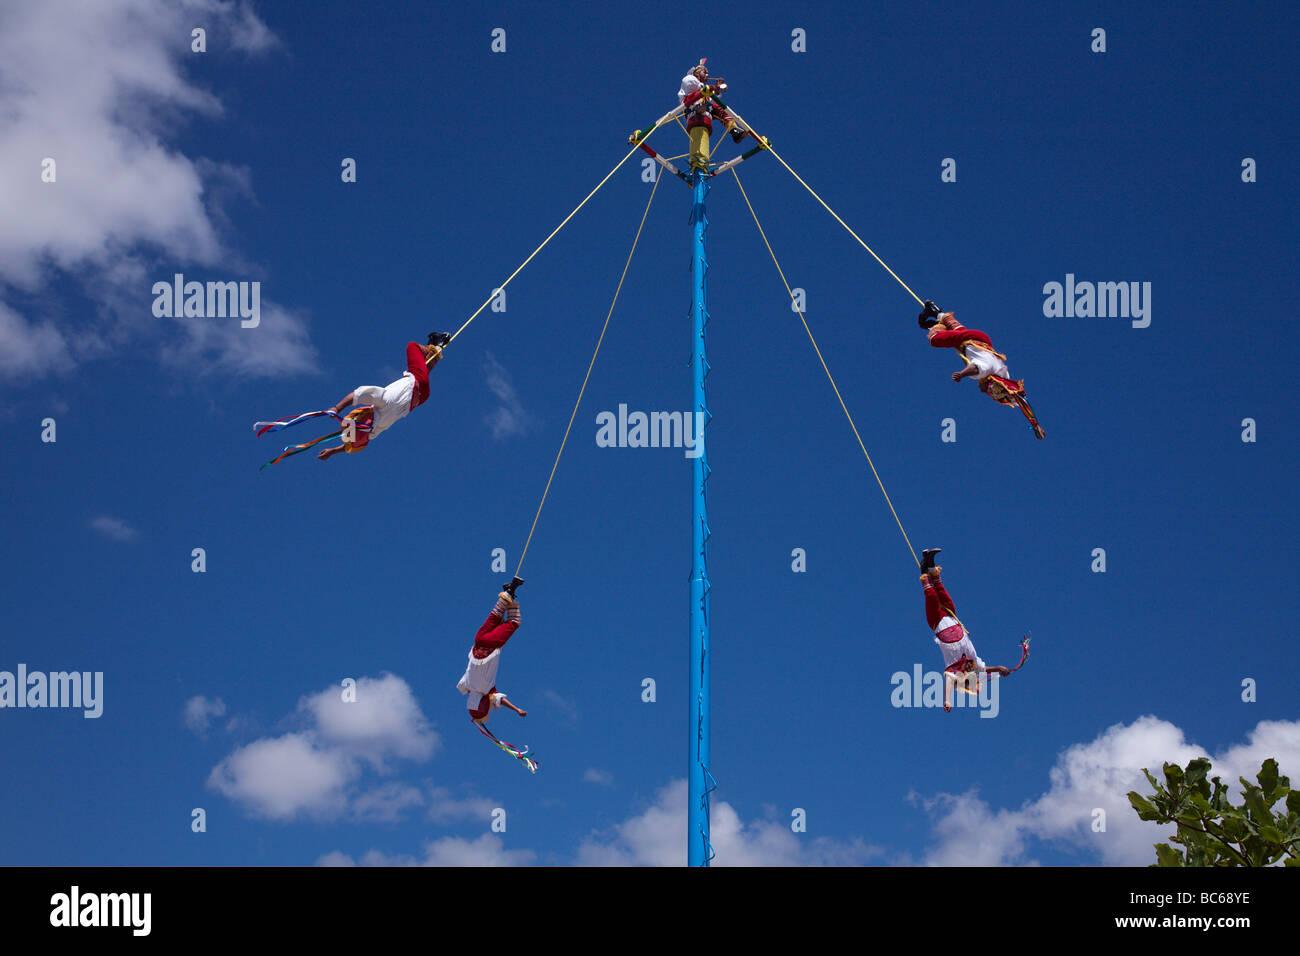 Papantla flying men show, Tulum, Mexico - Stock Image